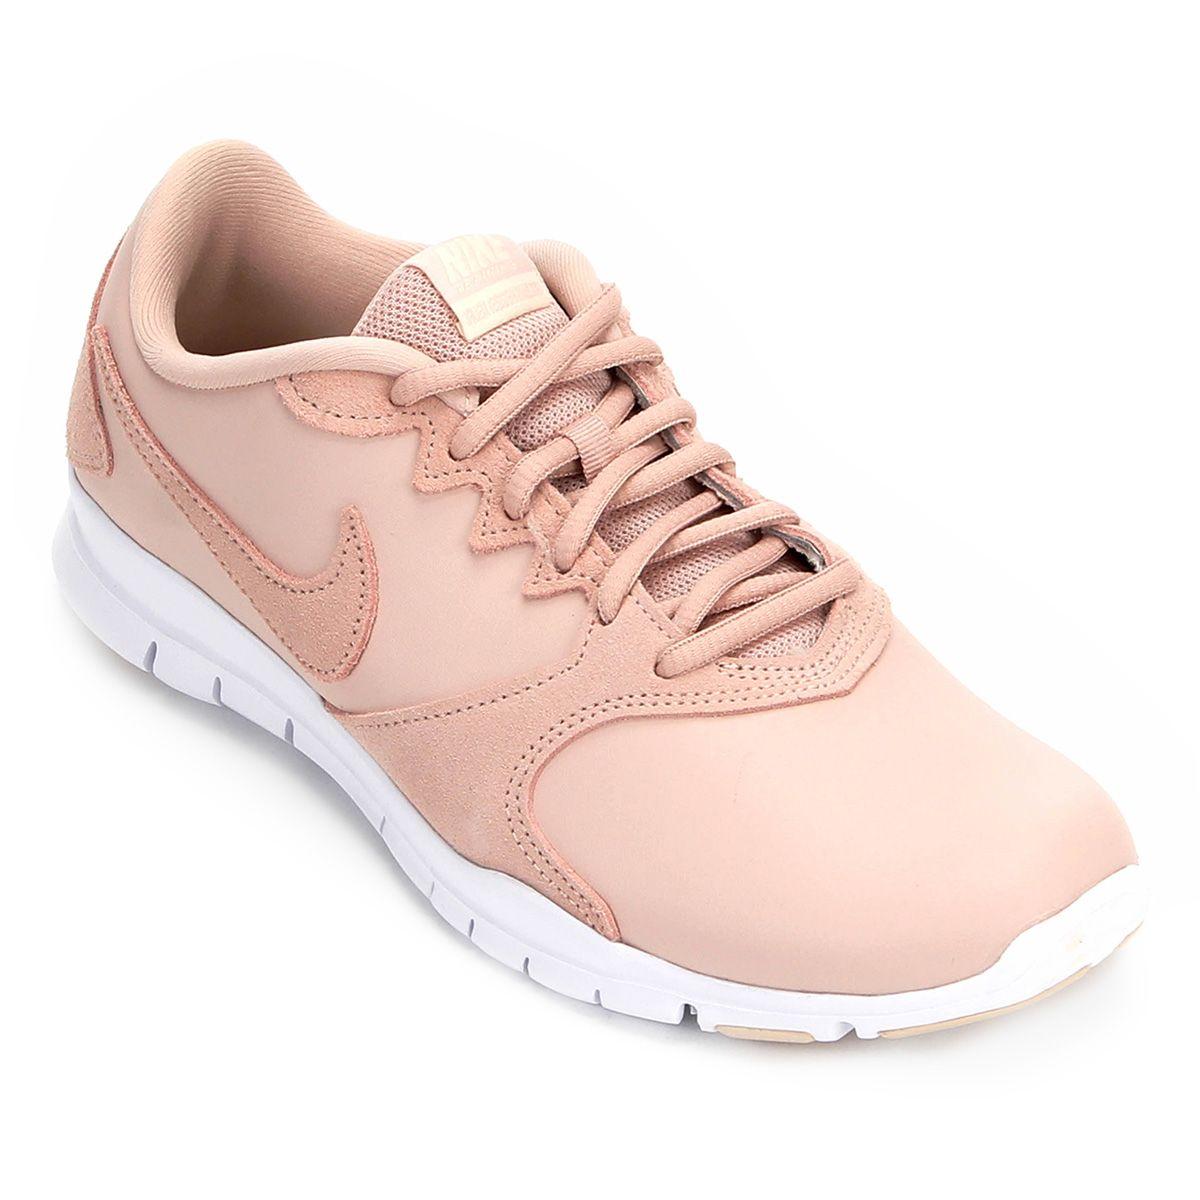 db5eed4618f Tênis Nike Flex Essential Tr Lt Feminino - Compre Agora